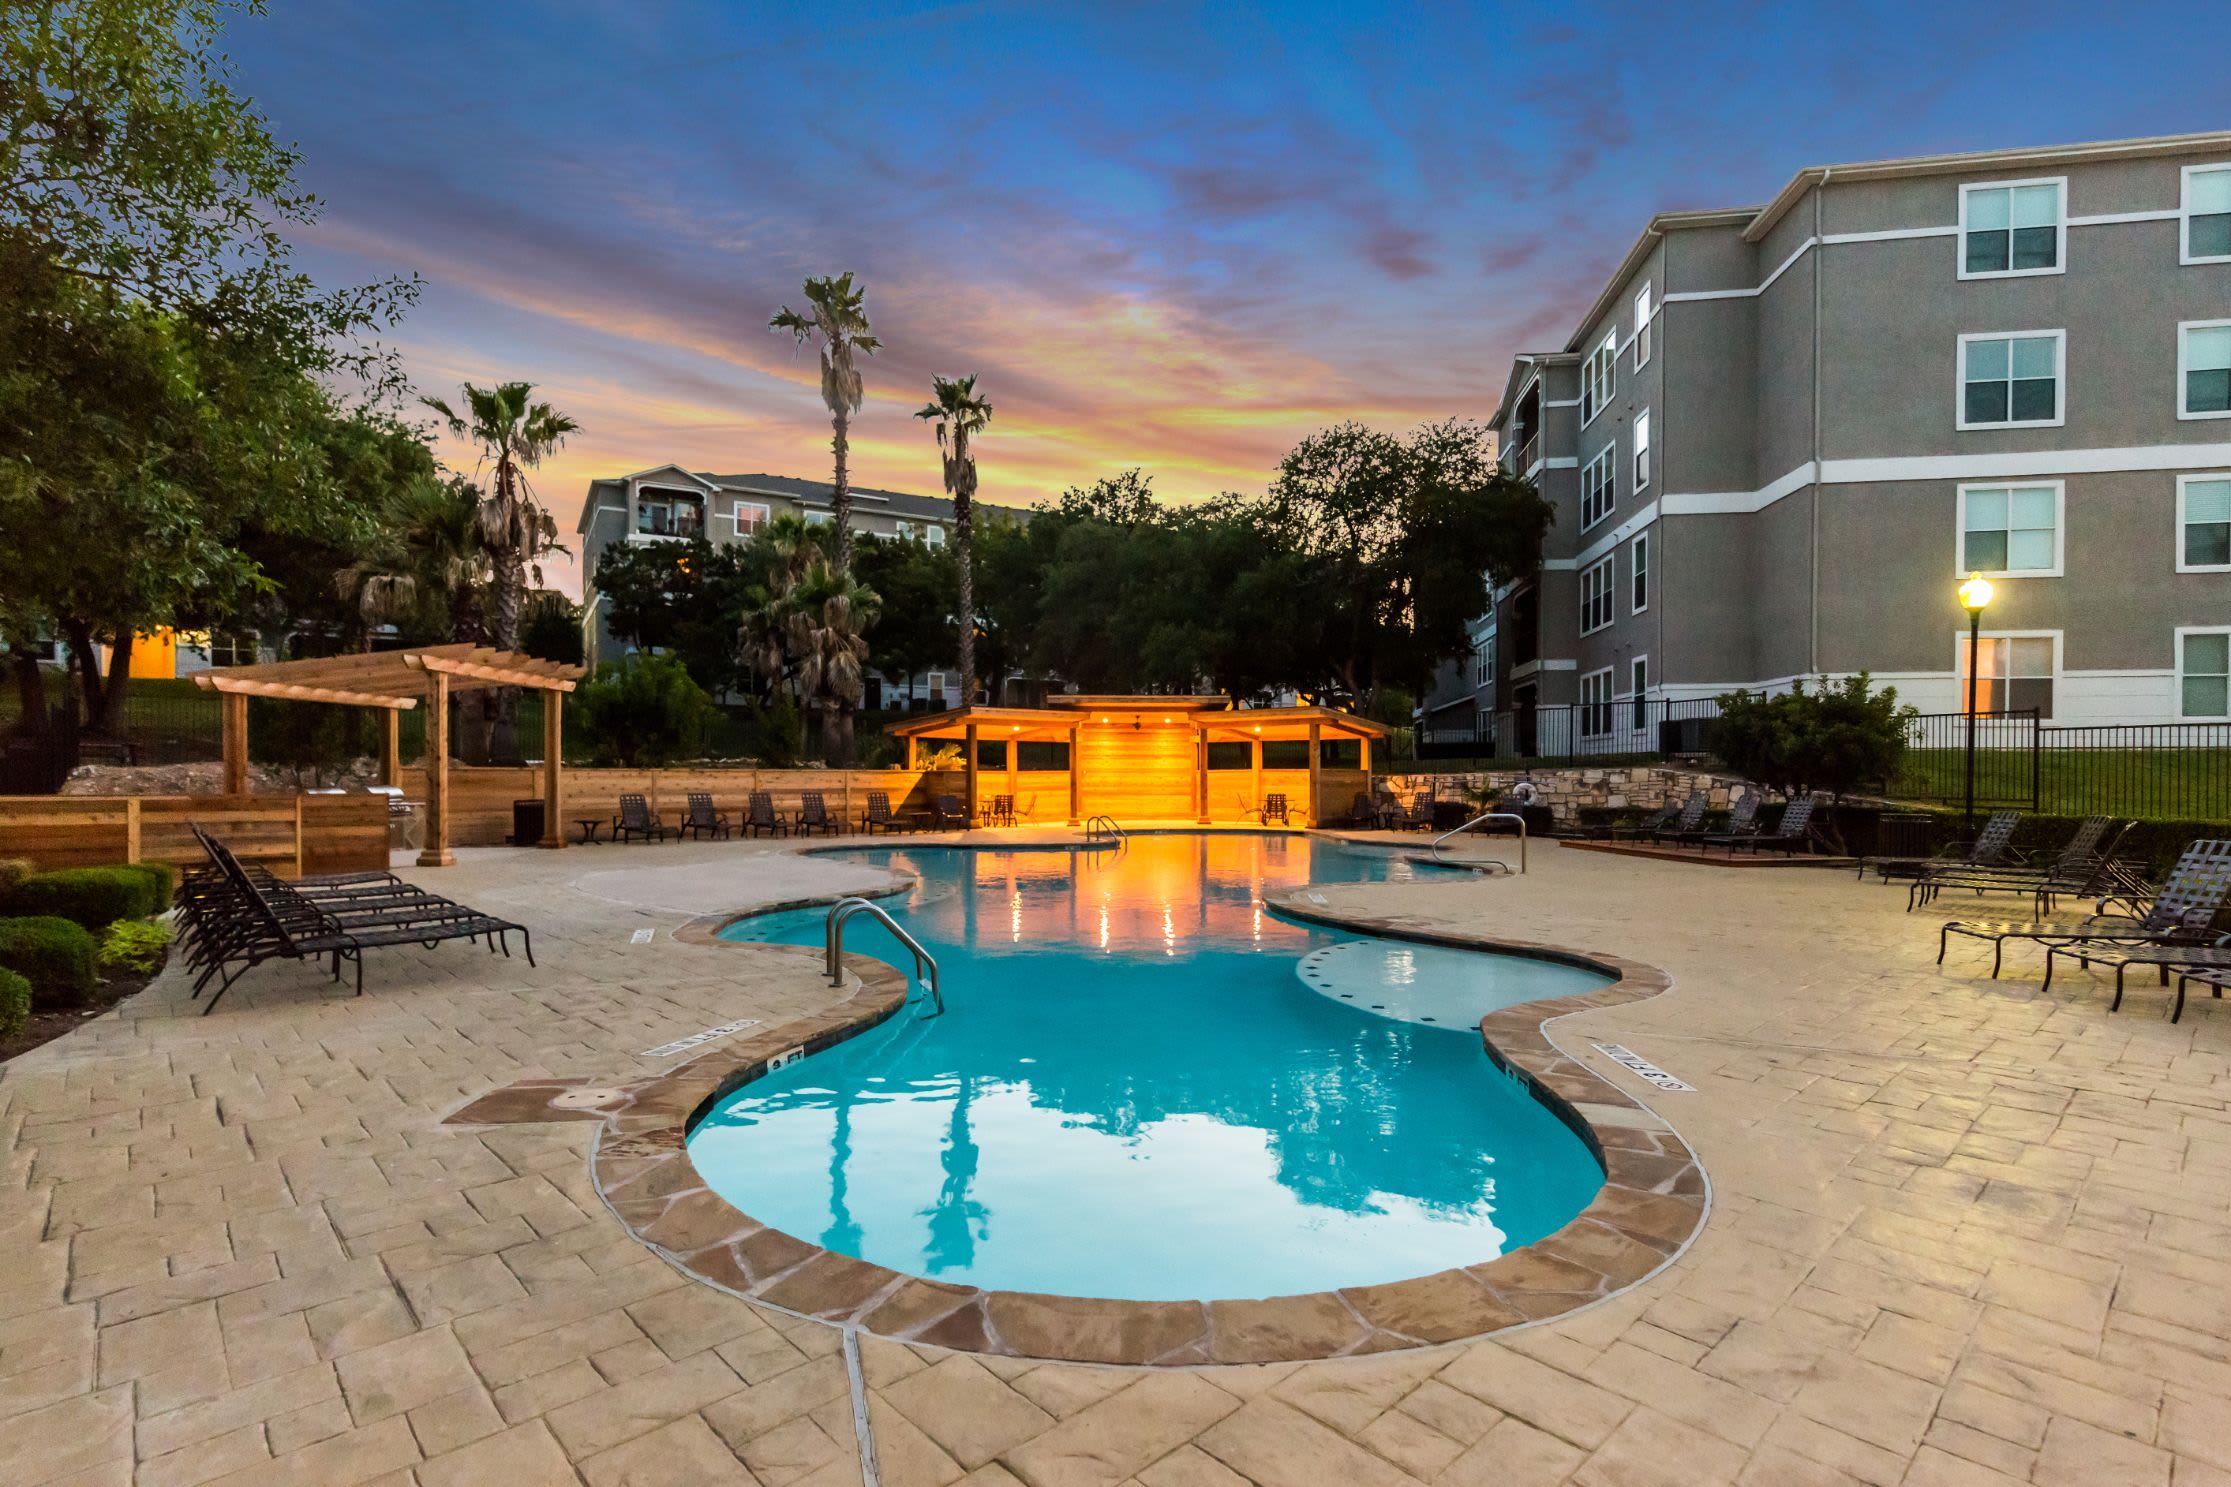 Swimming pool at sunset at Marquis at Crown Ridge in San Antonio, Texas